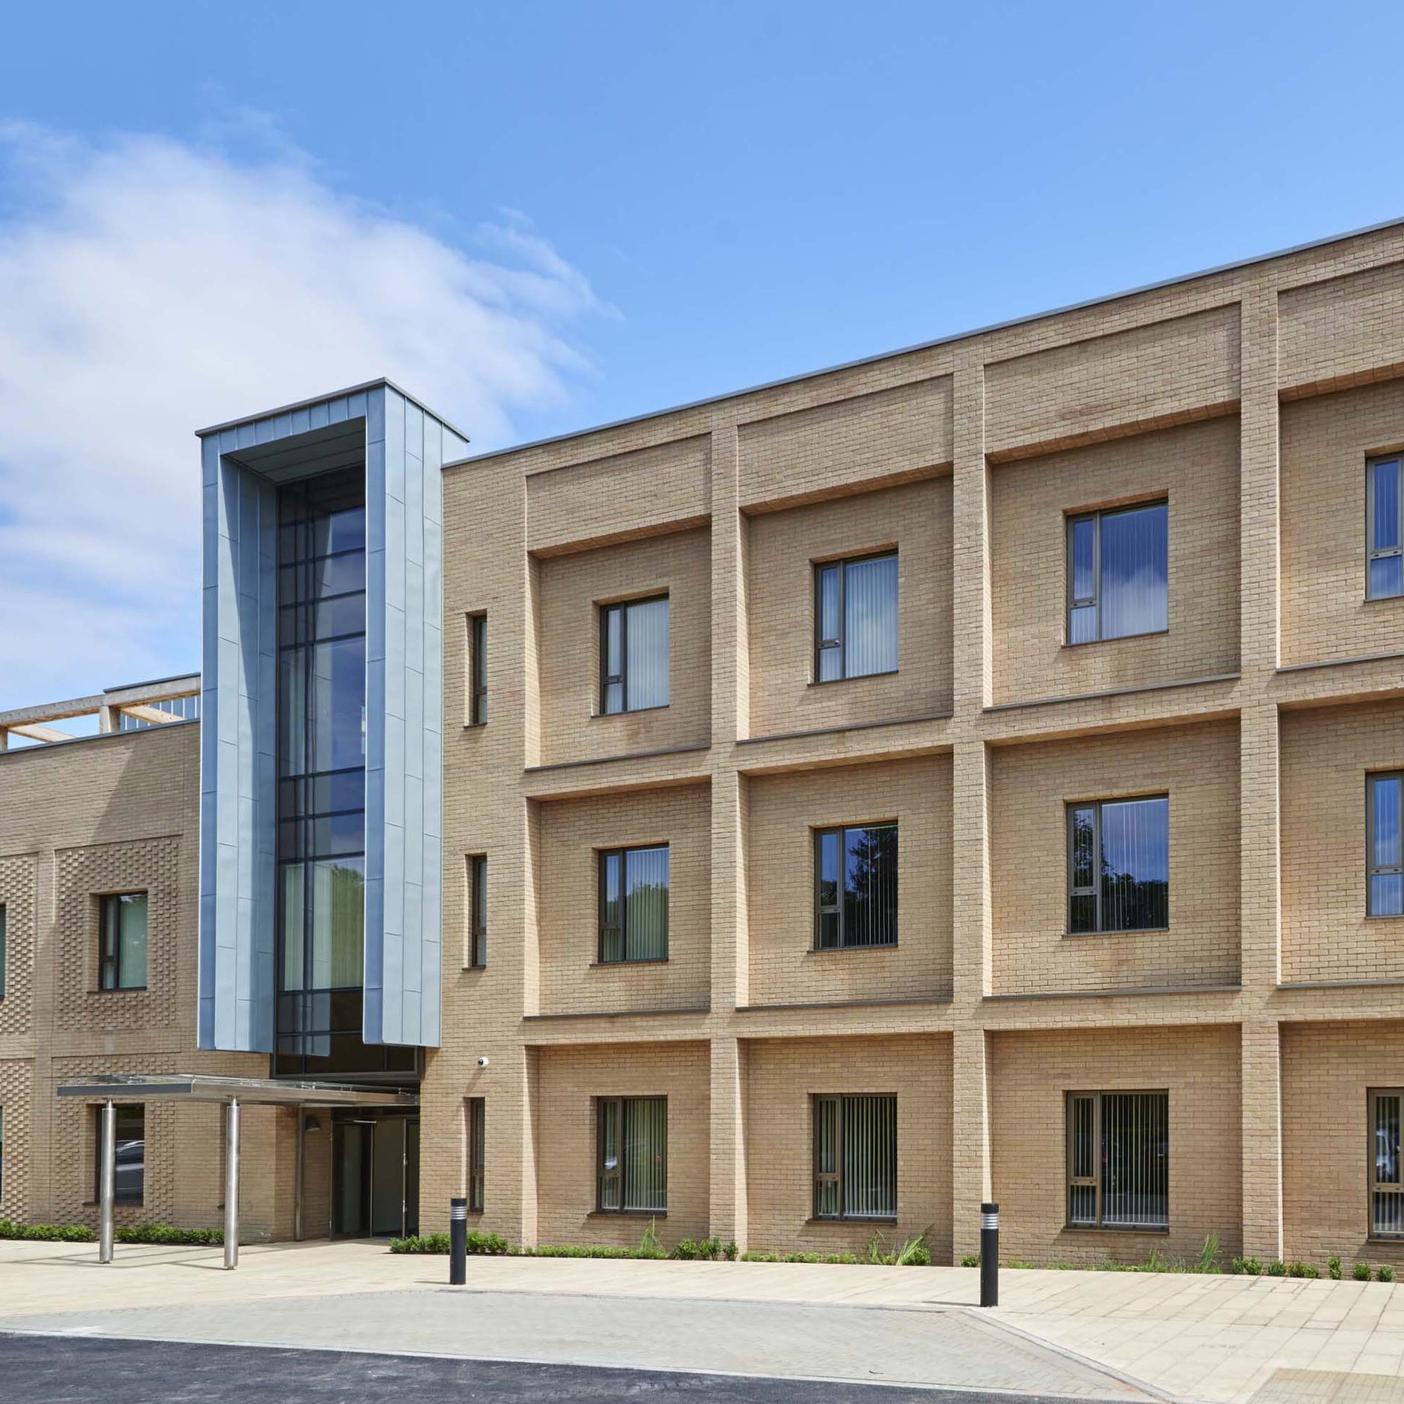 2.-Nuffield-Hospital-Cambridge-Exterior.jpg